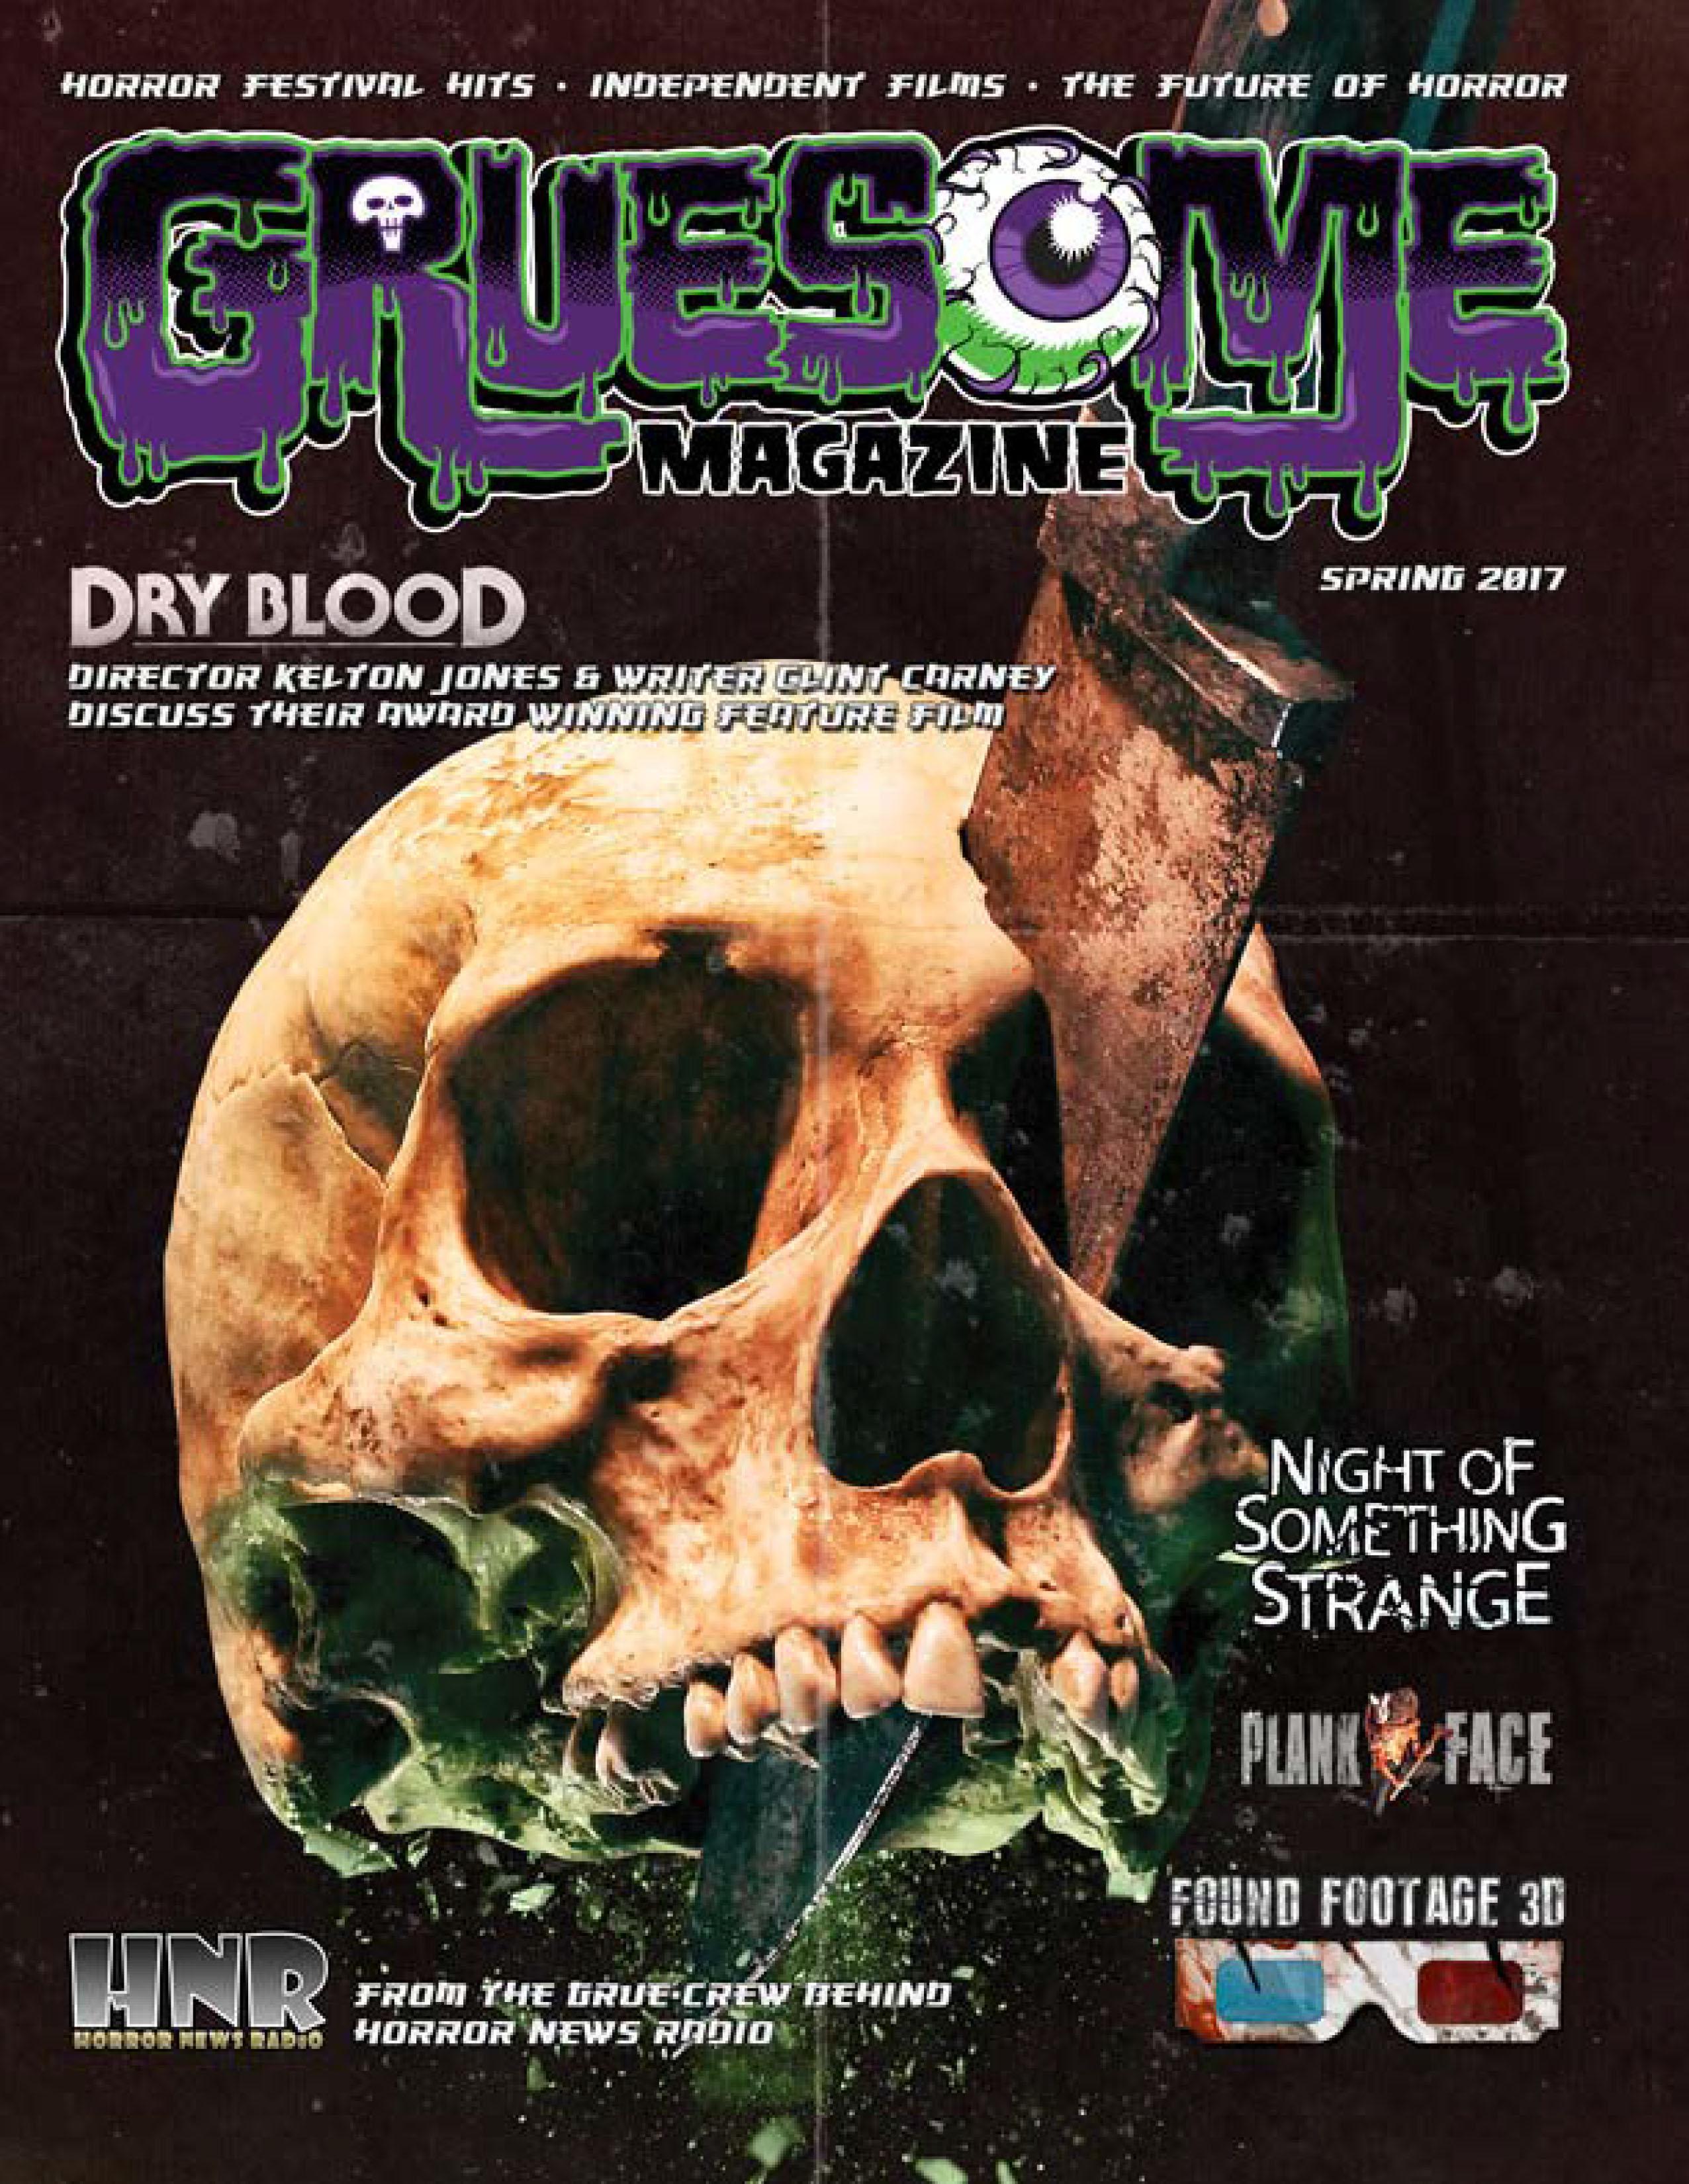 gruesome_magazine_spring_2017-1.jpg